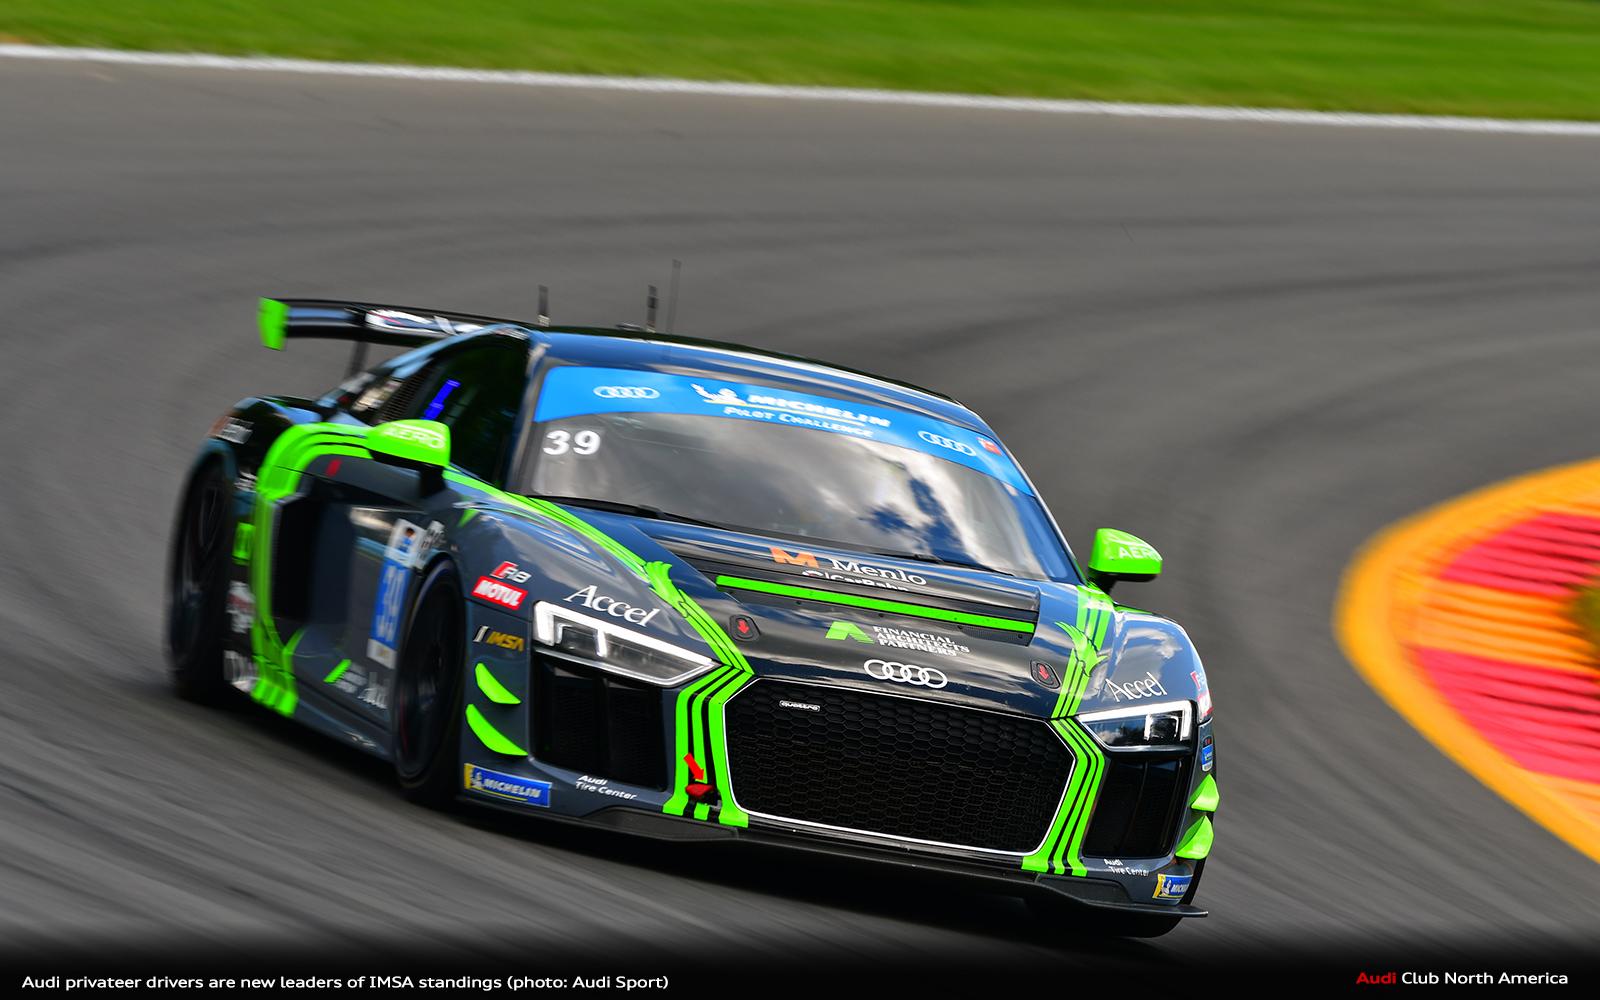 Audi Privateer Drivers Are New Leaders of IMSA Standings